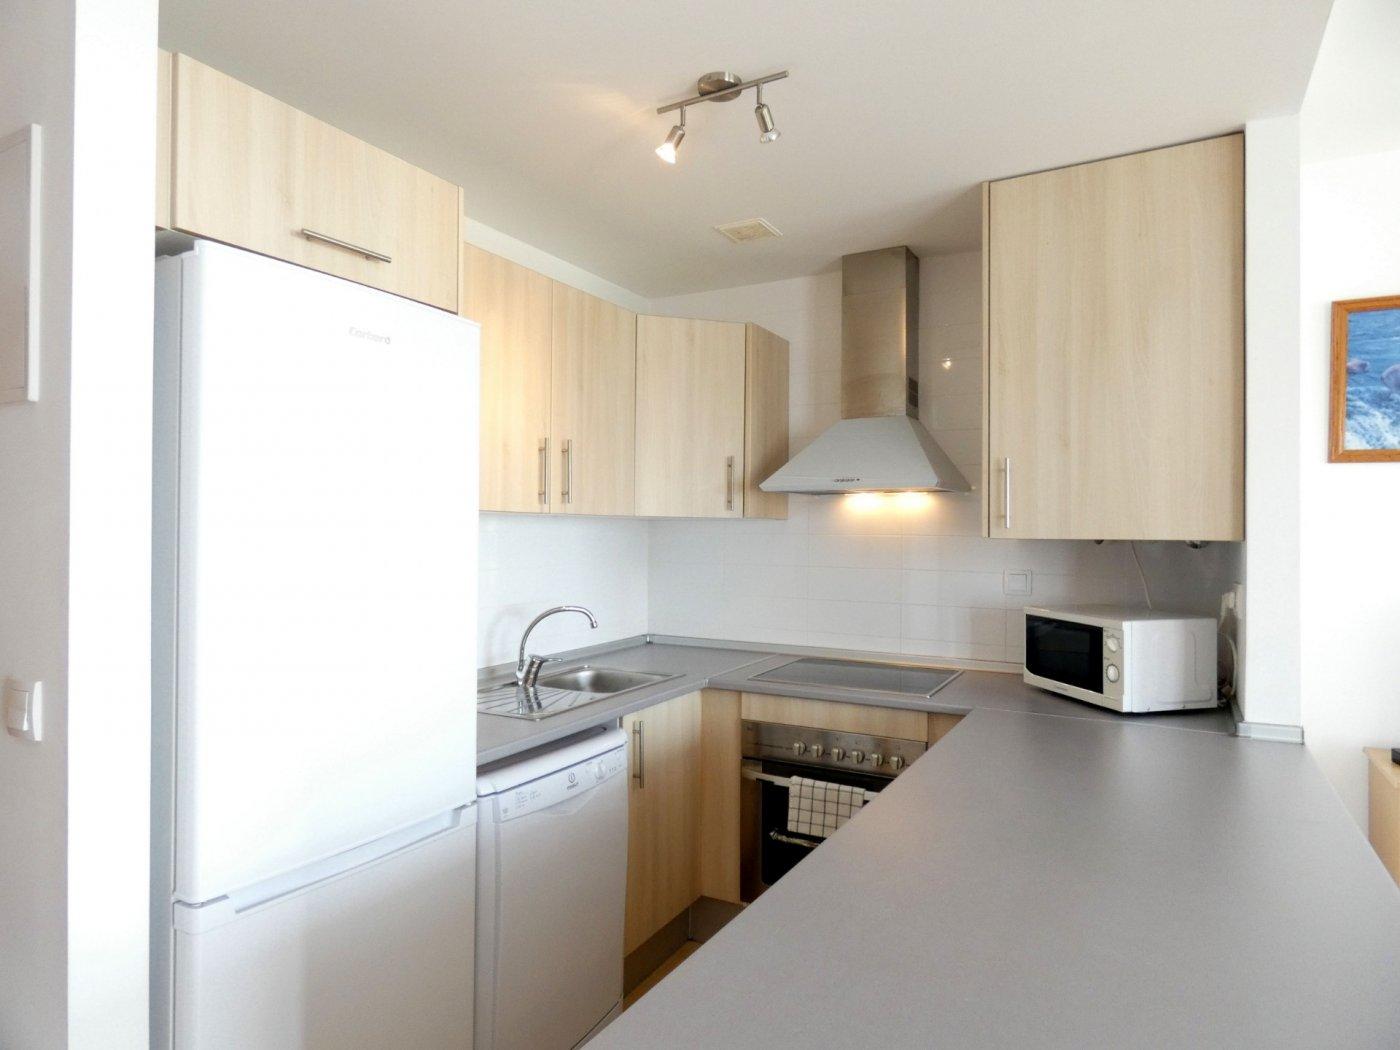 Gallery Image 21 of Key-Ready 2 Bedroom Apartment Overlooking the Citrus Groves in Jardin 10, Condado de Alhama